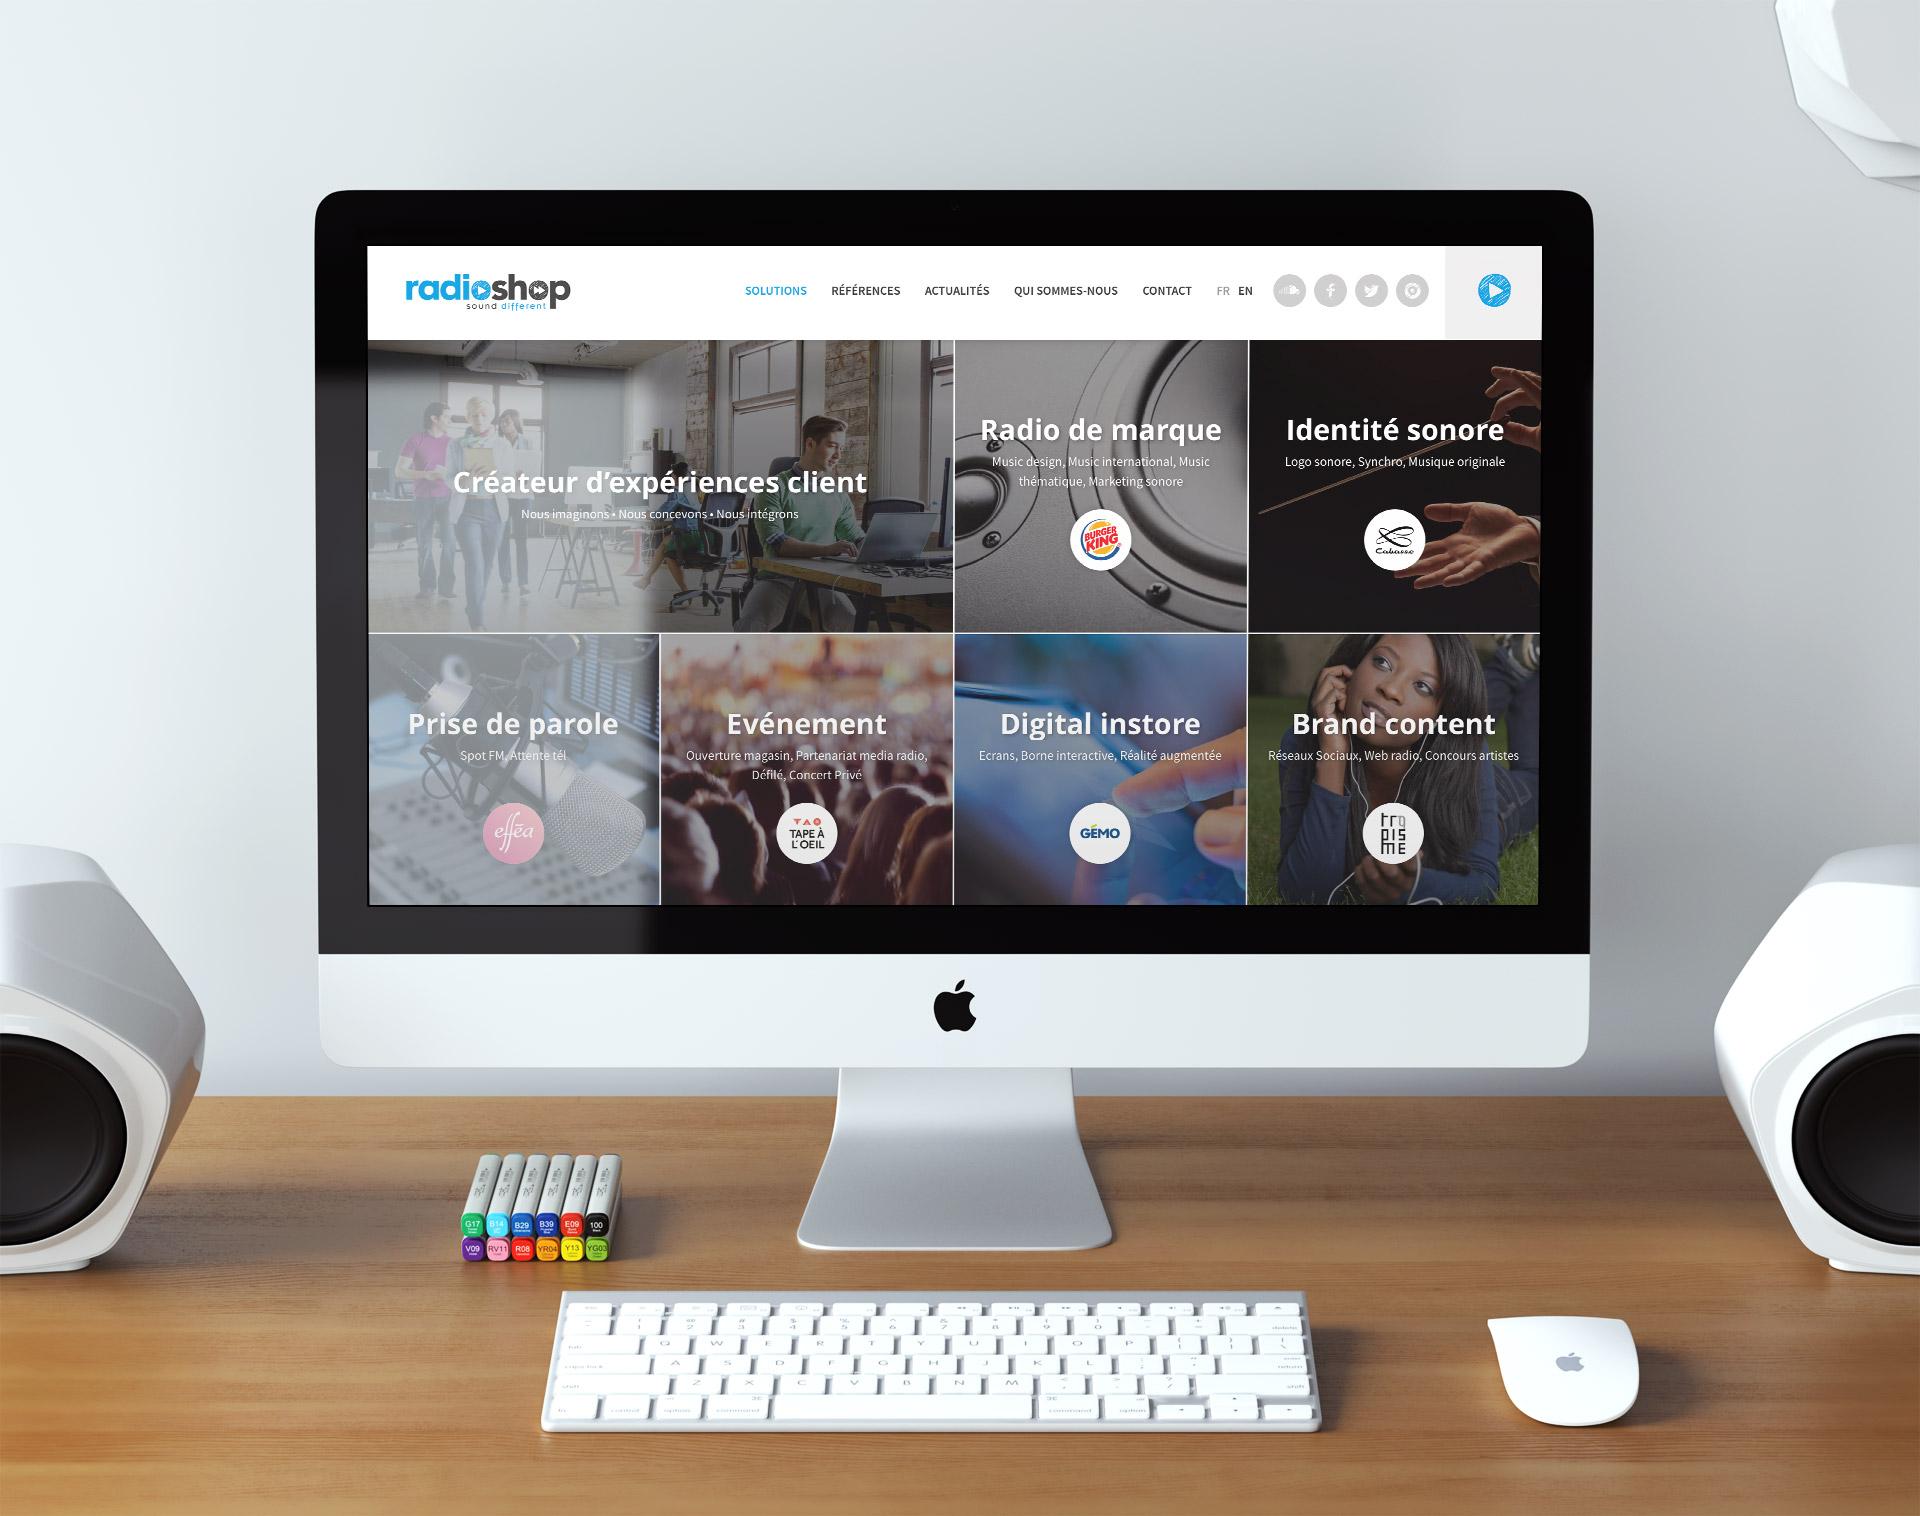 radioshop-creation-site-web-responsive-design-graphiste-montpellier-alexis-cretin